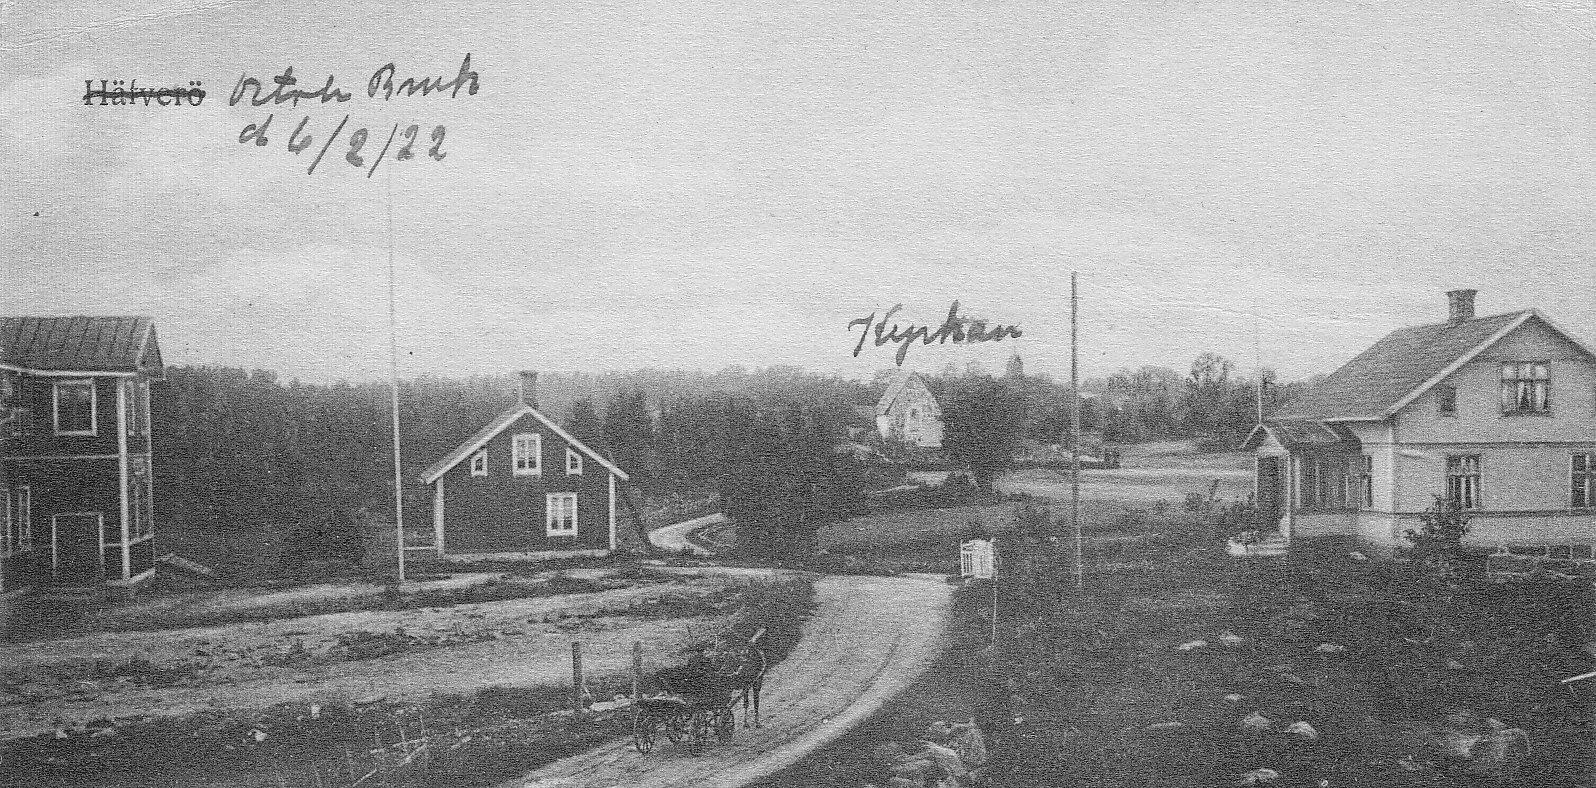 Skickat 1922